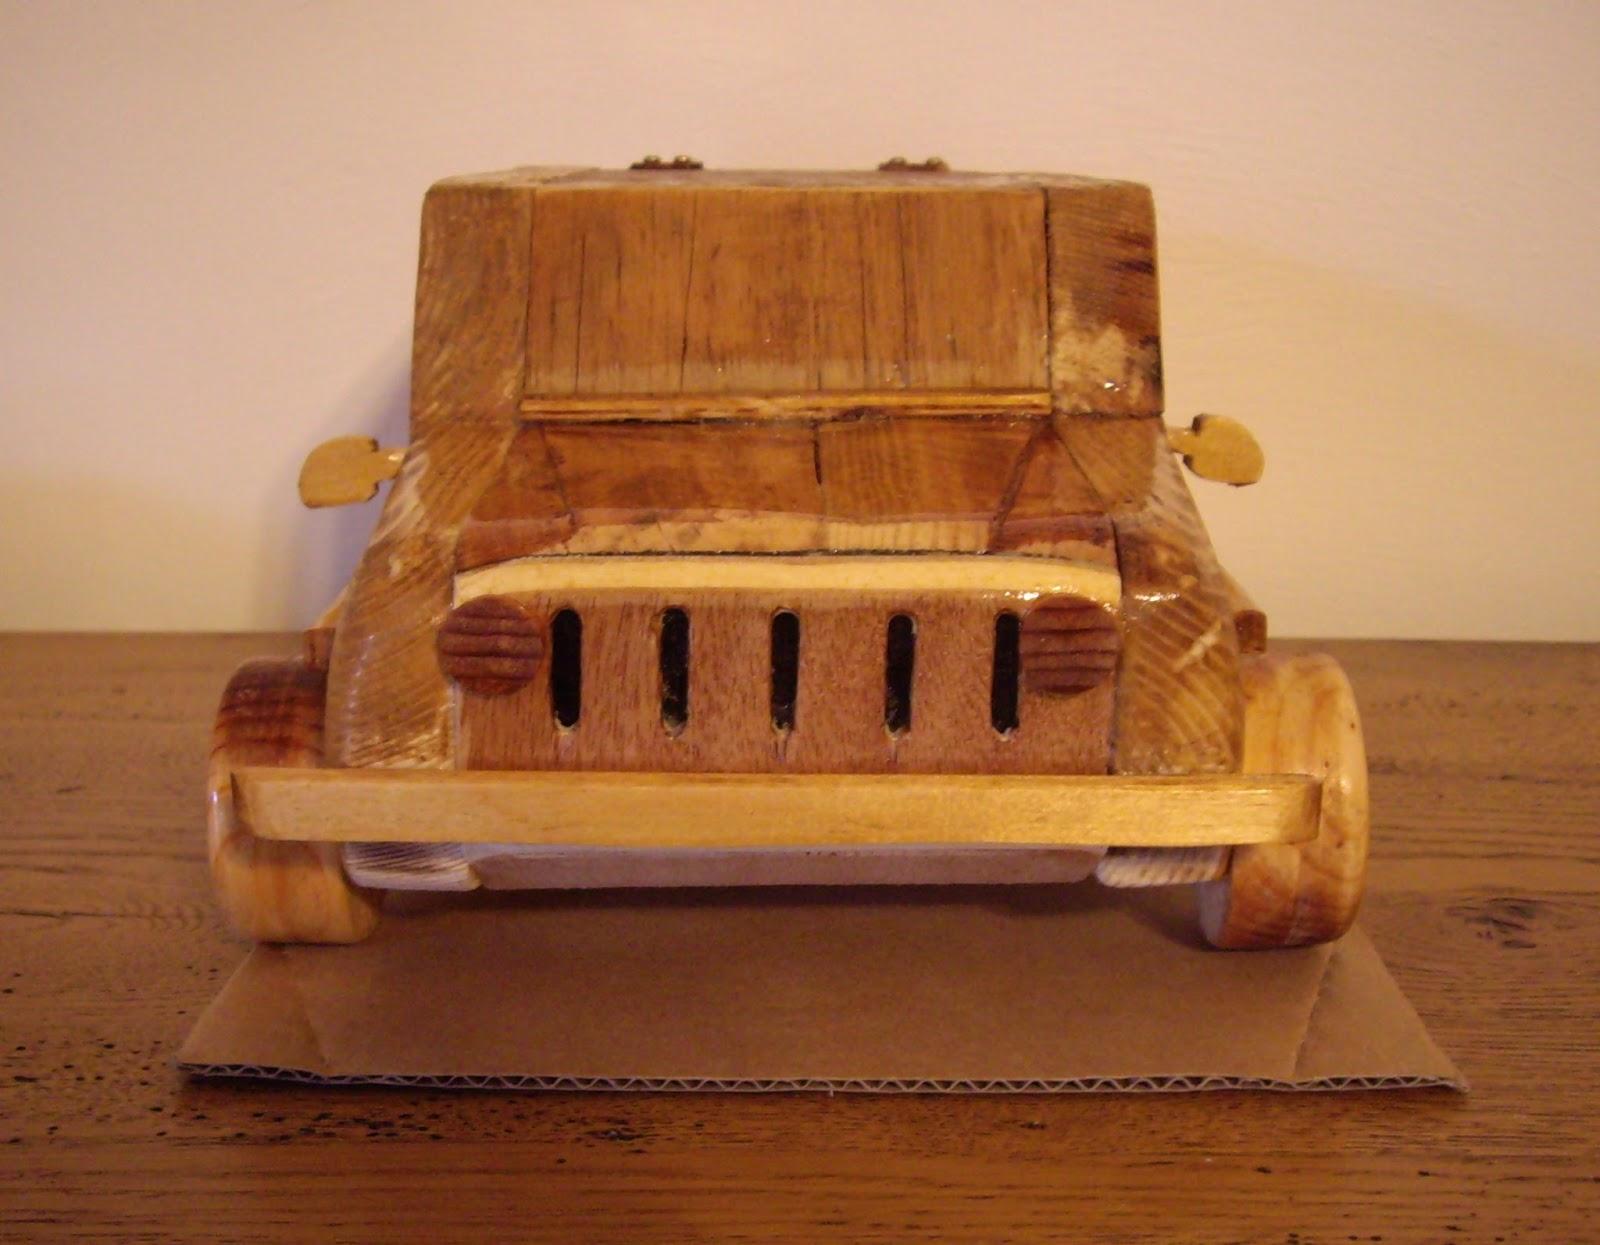 Objets d co tutoriels et meubles en bois de palettes jeep wrangler en bois - Objet en palette en bois ...